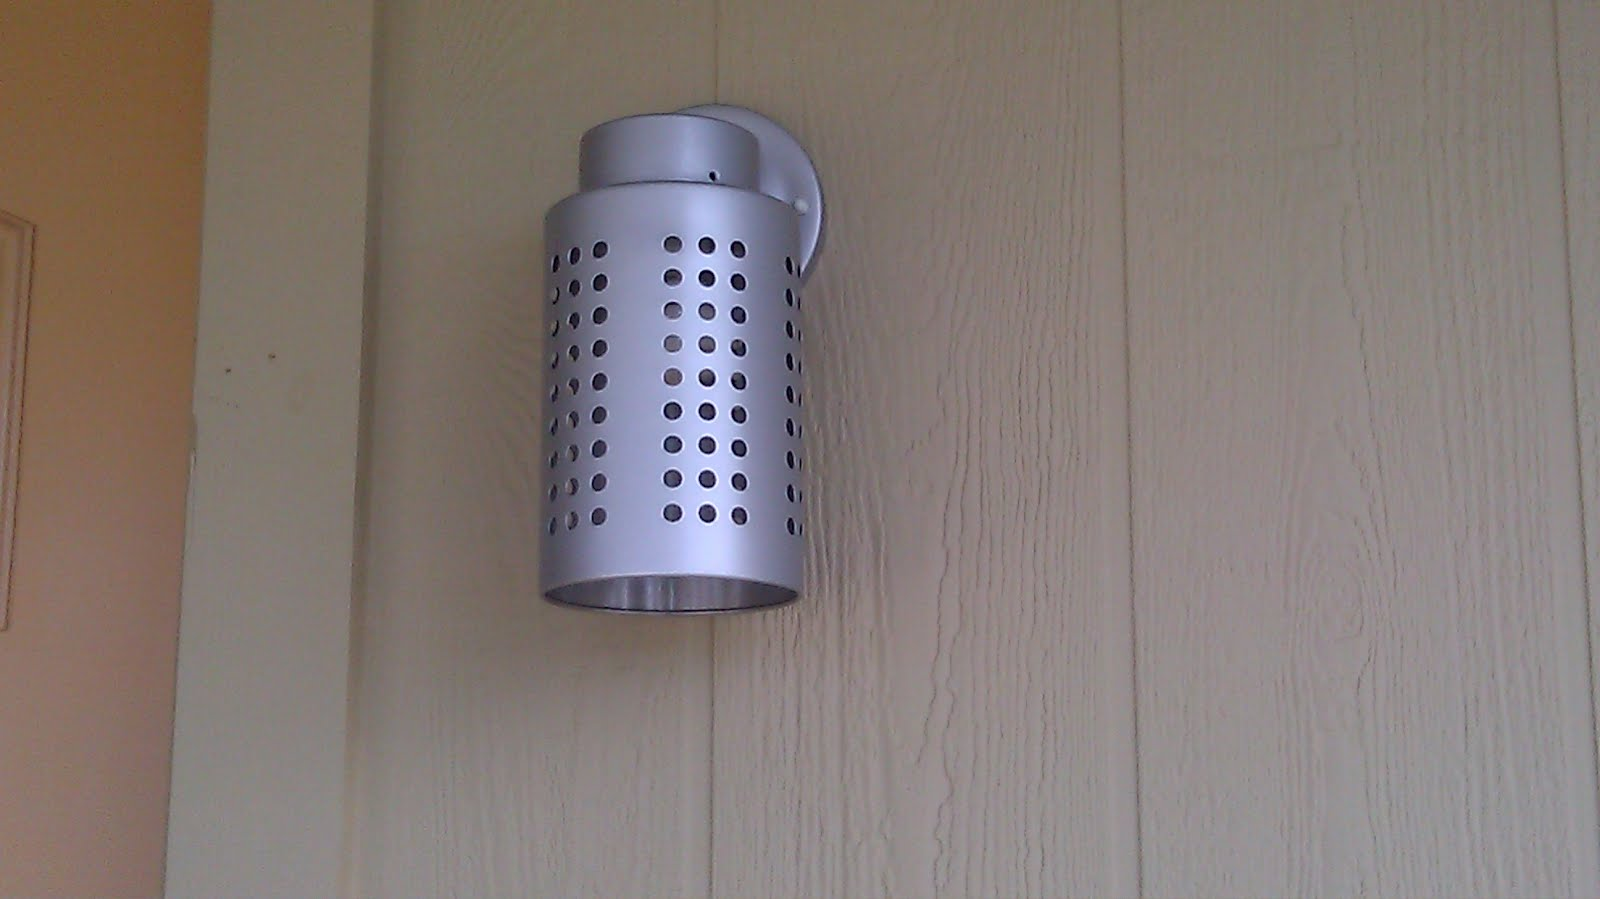 Outdoor Lighting Ikea - Interior Design Company